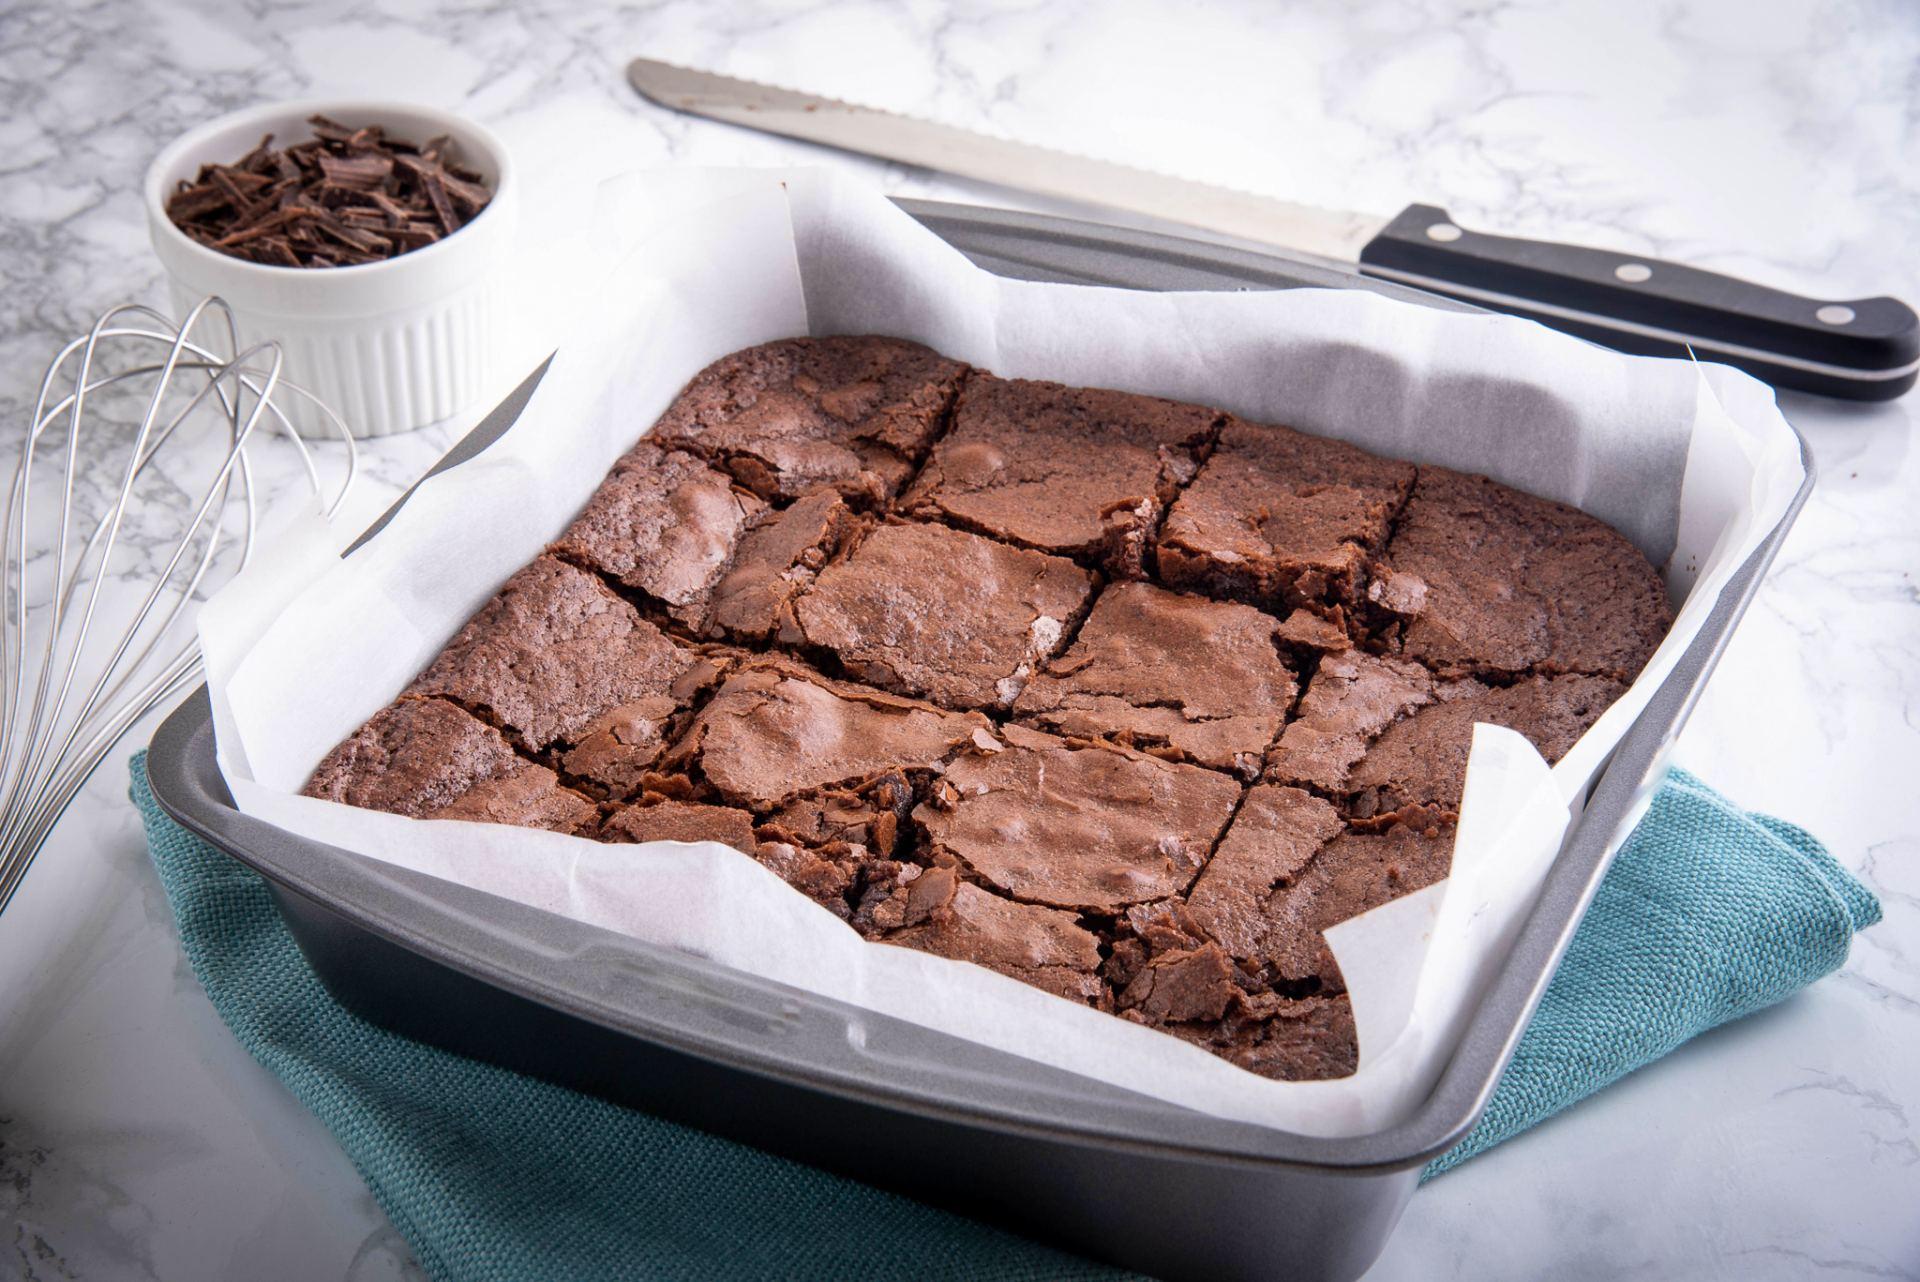 Tray of chocolate brownies